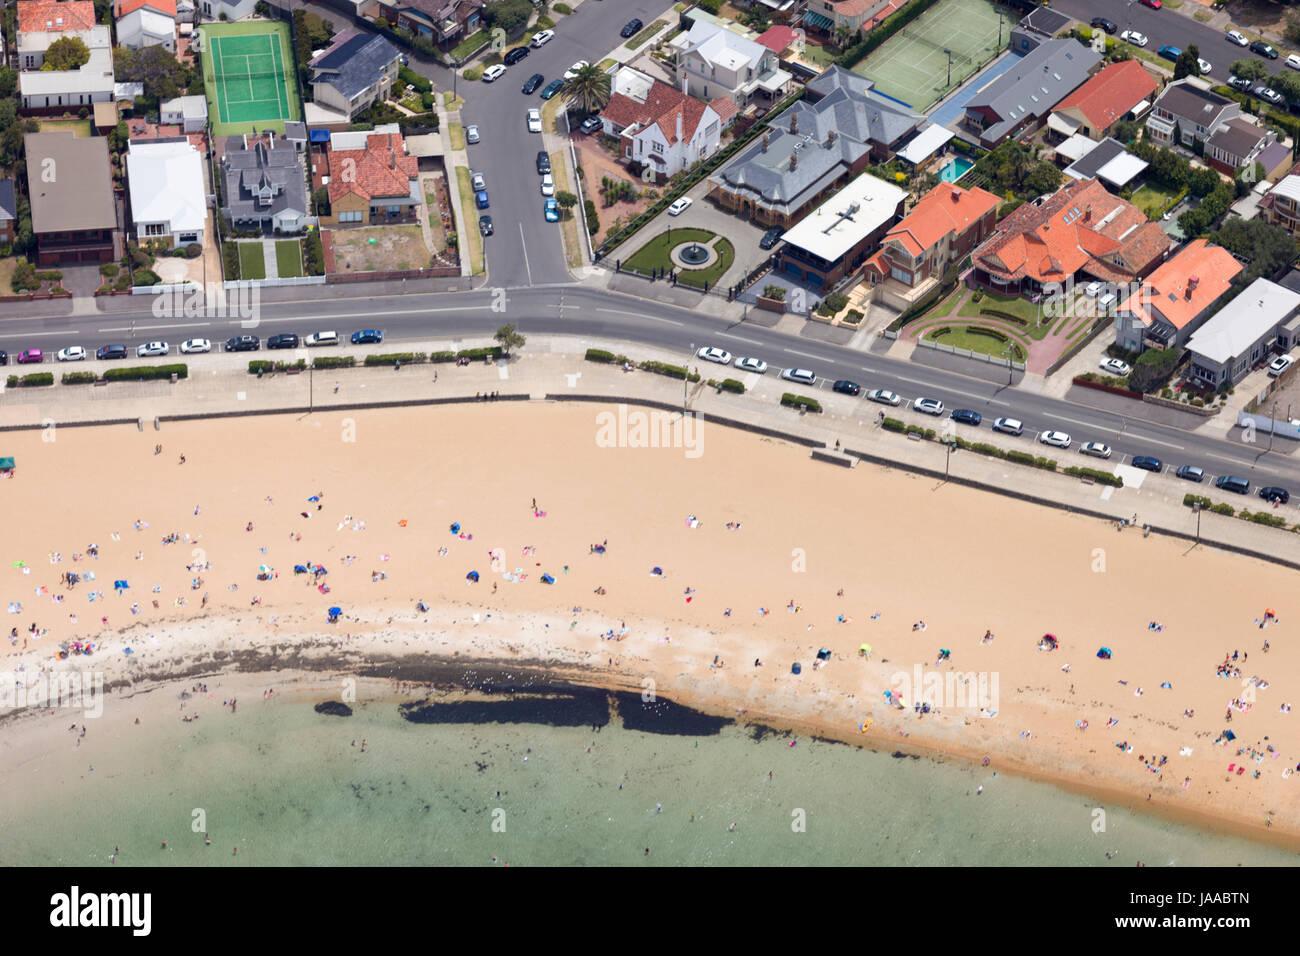 Aerial view of Brighton beach. - Stock Image